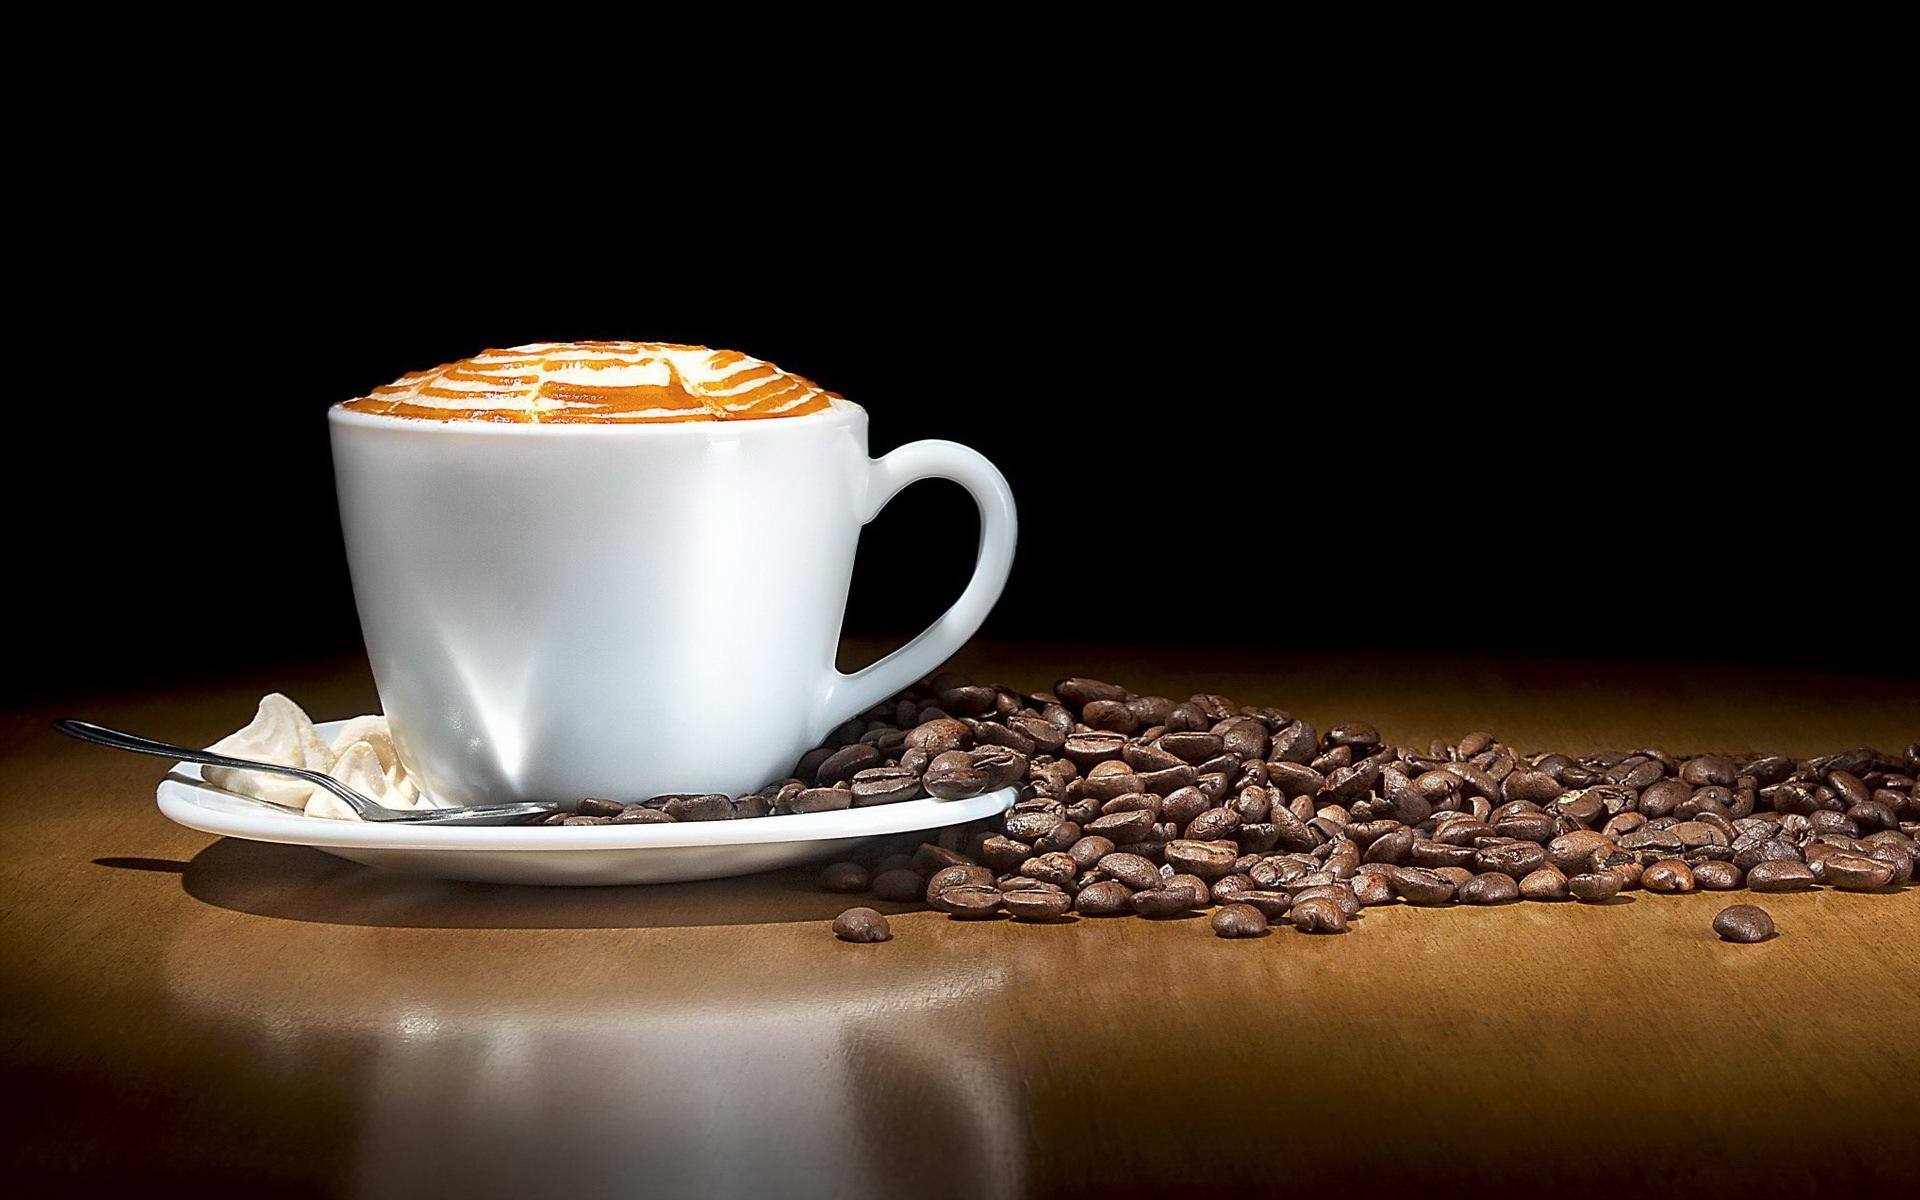 Wallpaper Coffee Theme - WallpaperSafari